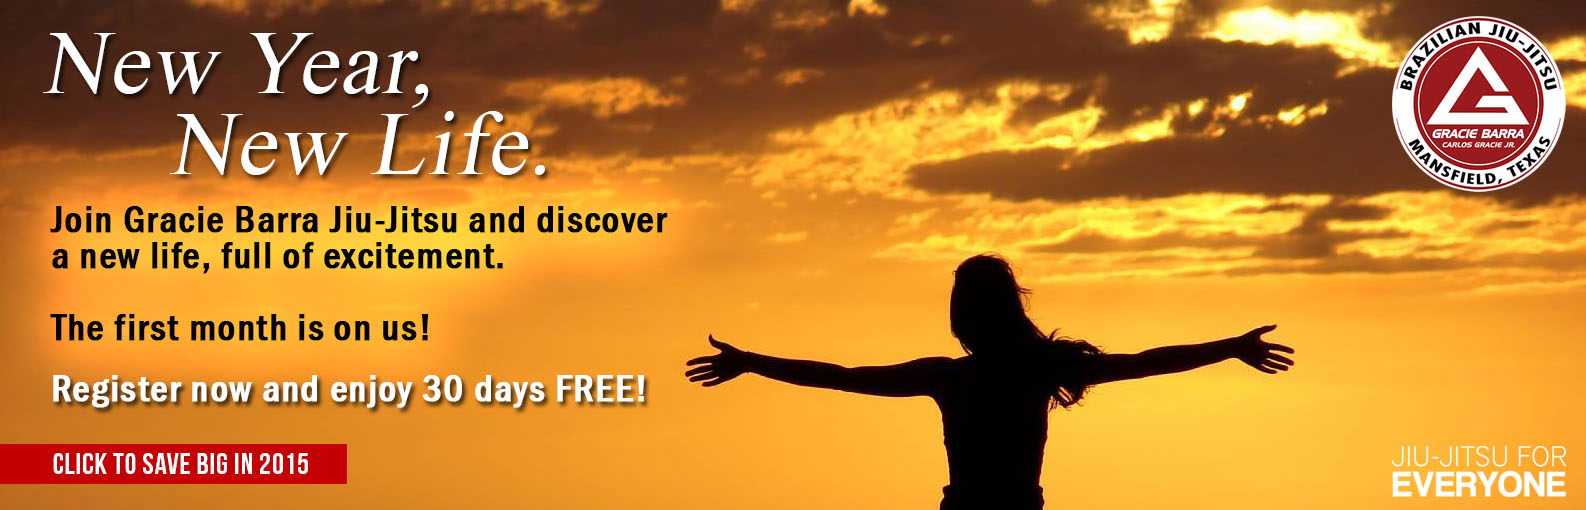 Start your New Year with a New Life at Gracie Barra Jiu-Jitsu Mansfield & Arlington TX